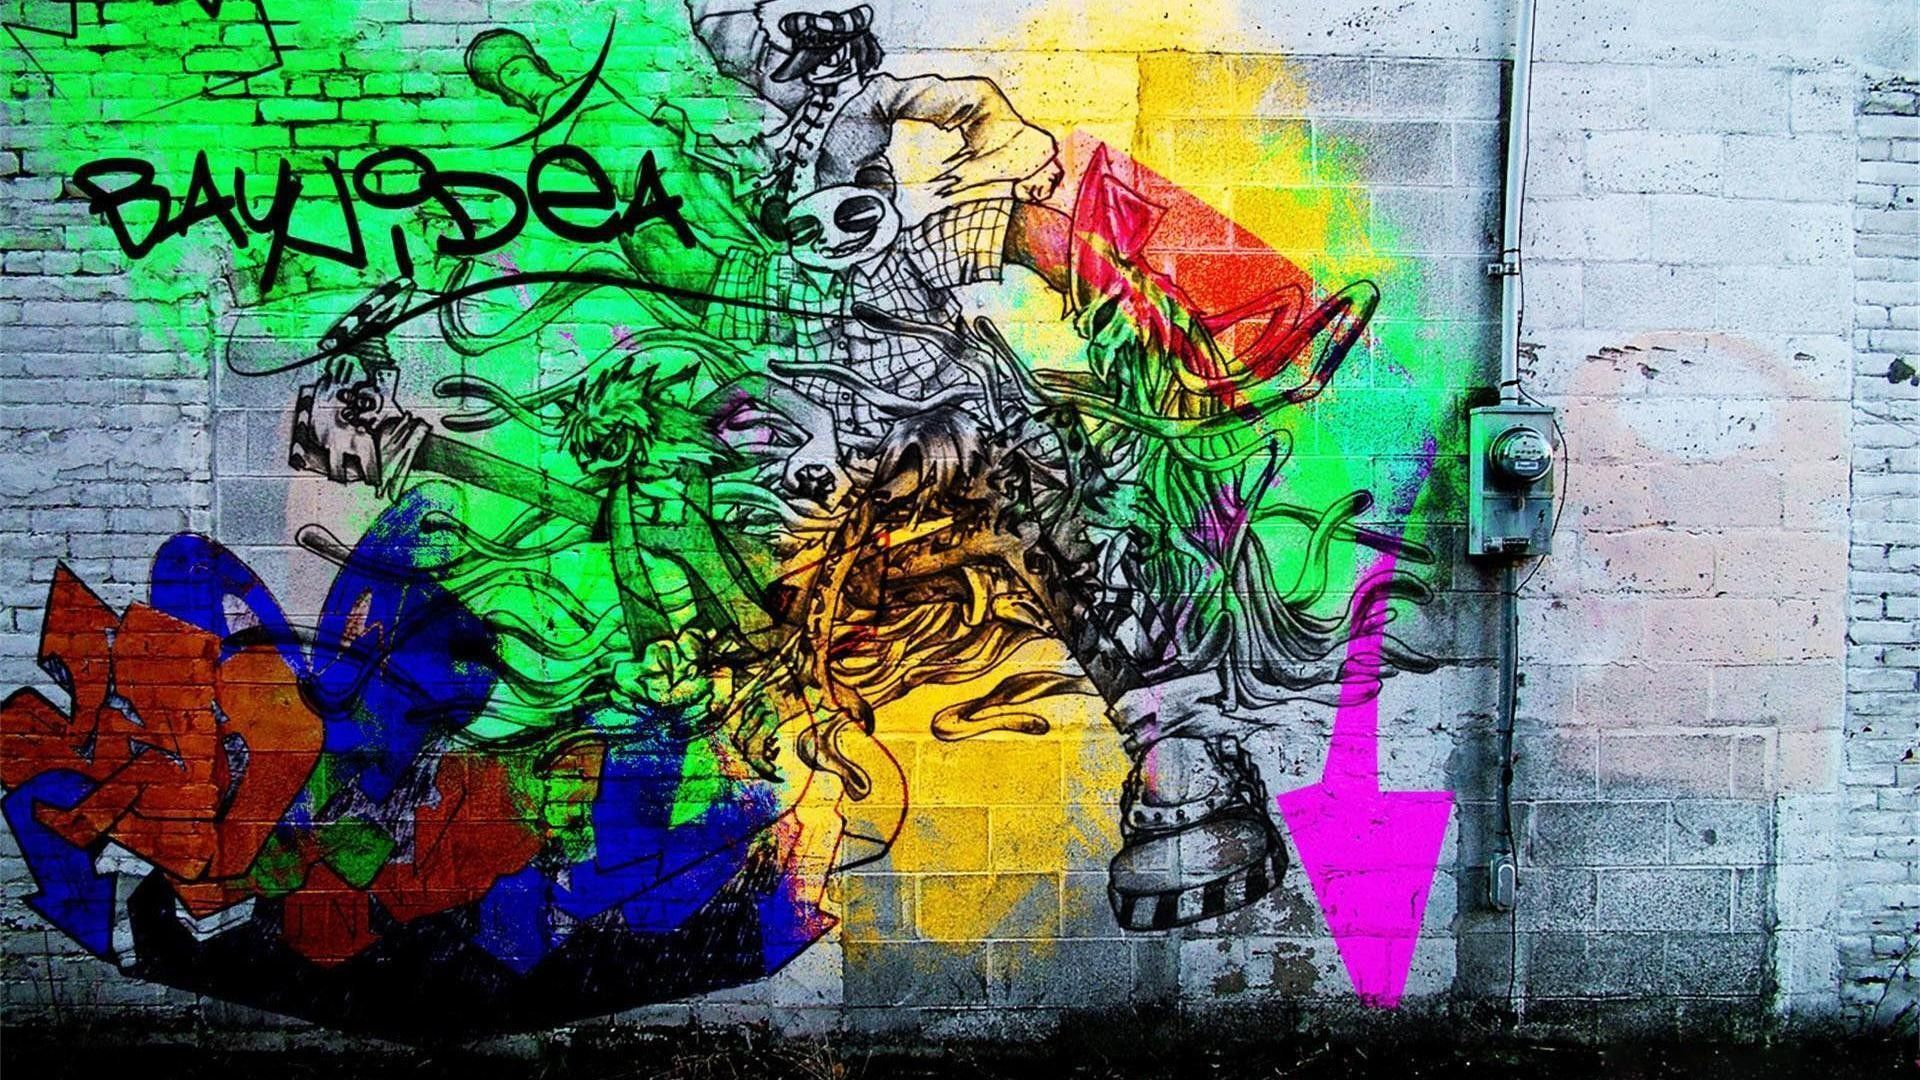 Street Art Hd Wallpaper 2021 Live Wallpaper Hd Graffiti Wallpaper Art Wallpaper Wallpaper Wa